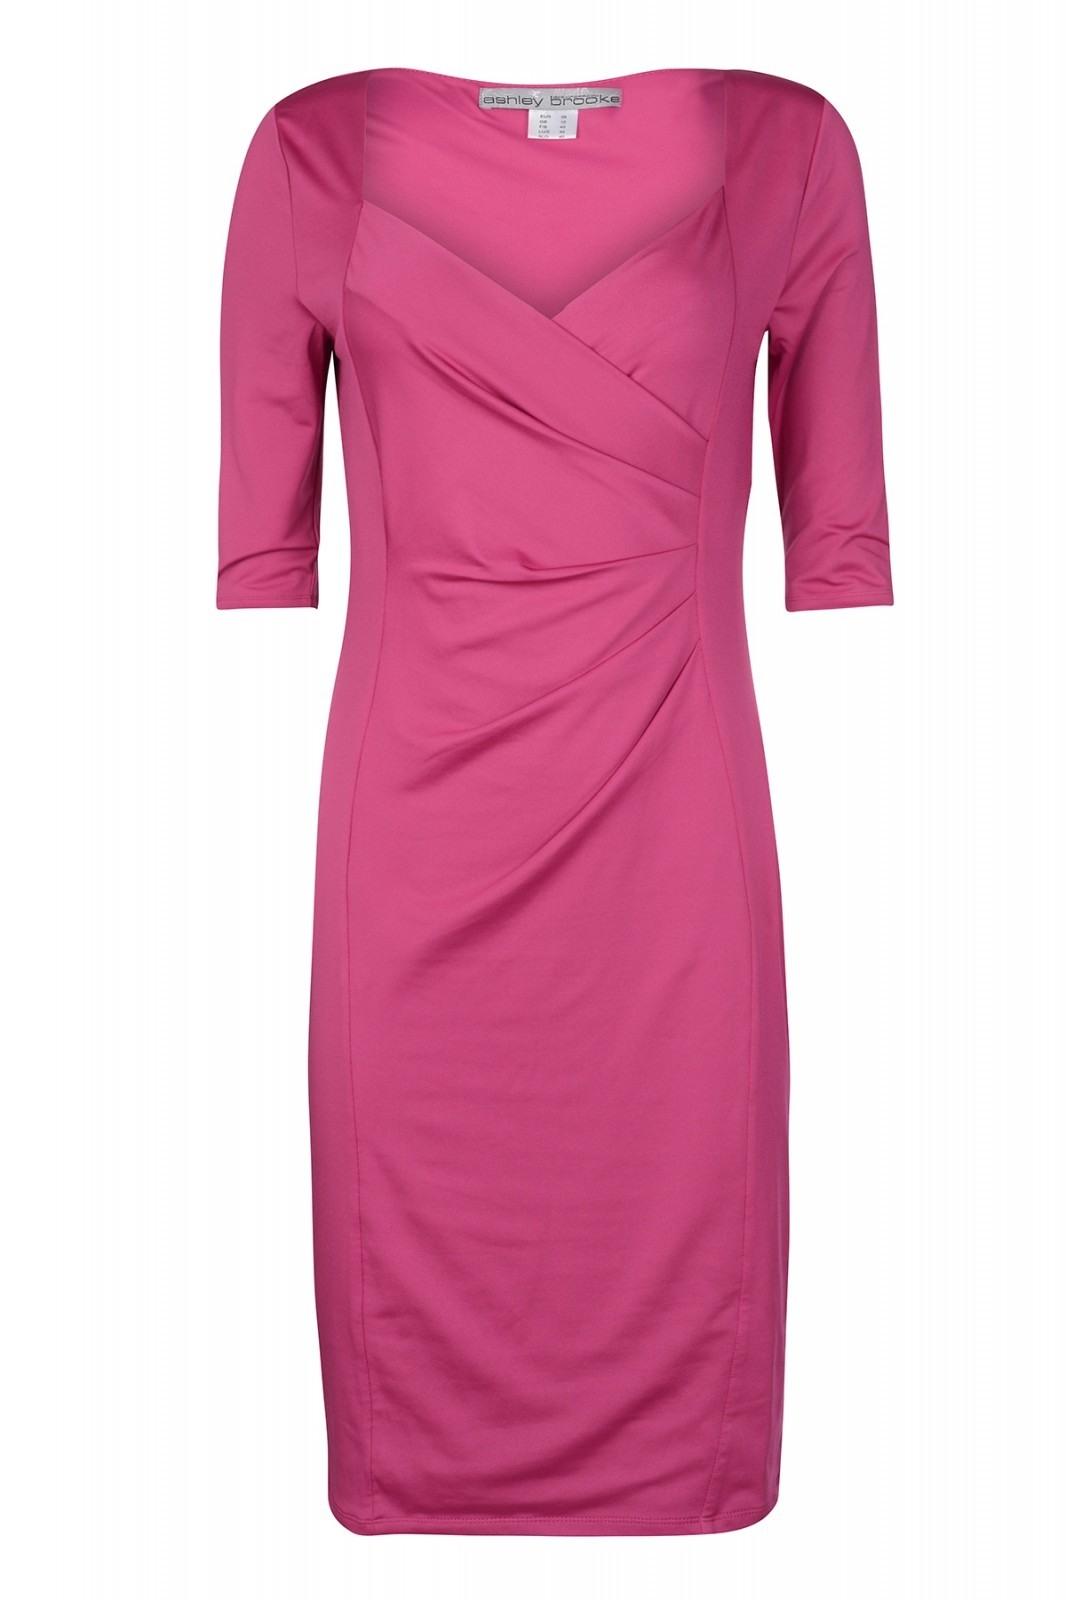 10 Spektakulär Wickelkleid Abendkleid Vertrieb Top Wickelkleid Abendkleid Bester Preis